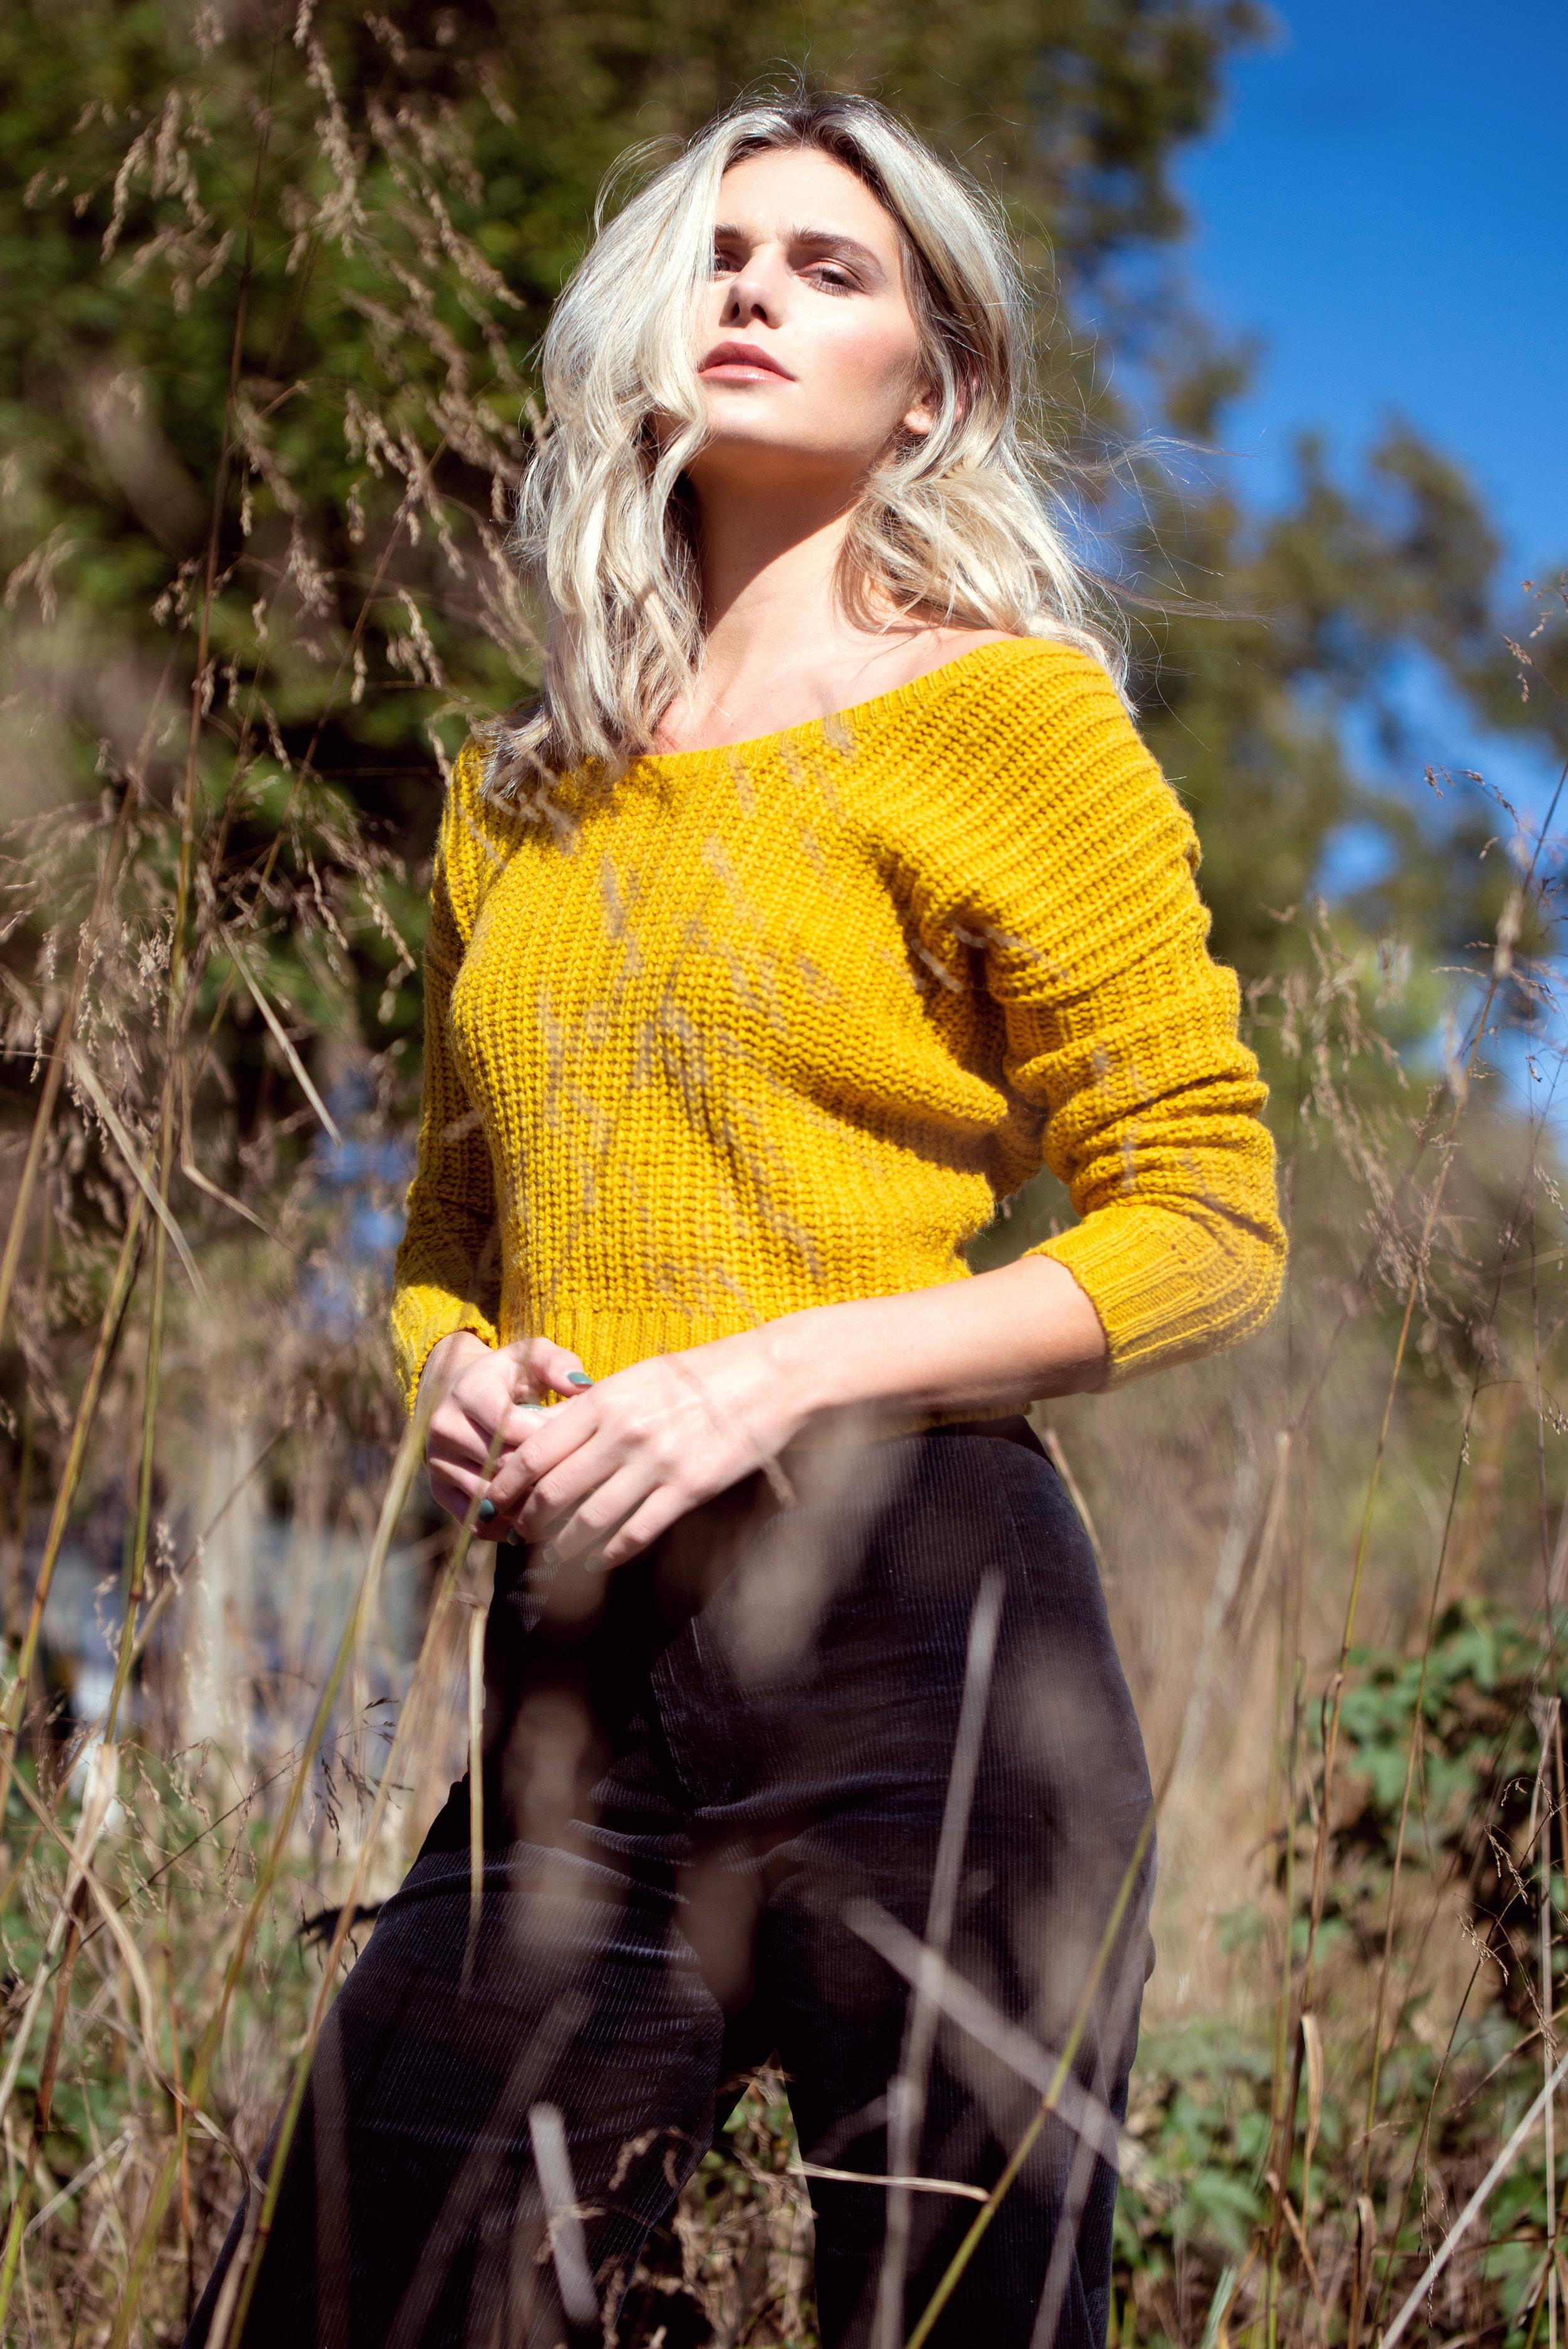 Model: Caitlin McCormick  Agency: Ford Chicago, Wilhelmina LA, Click Models of Atlanta  Makeup: Elite Makeup Artistry